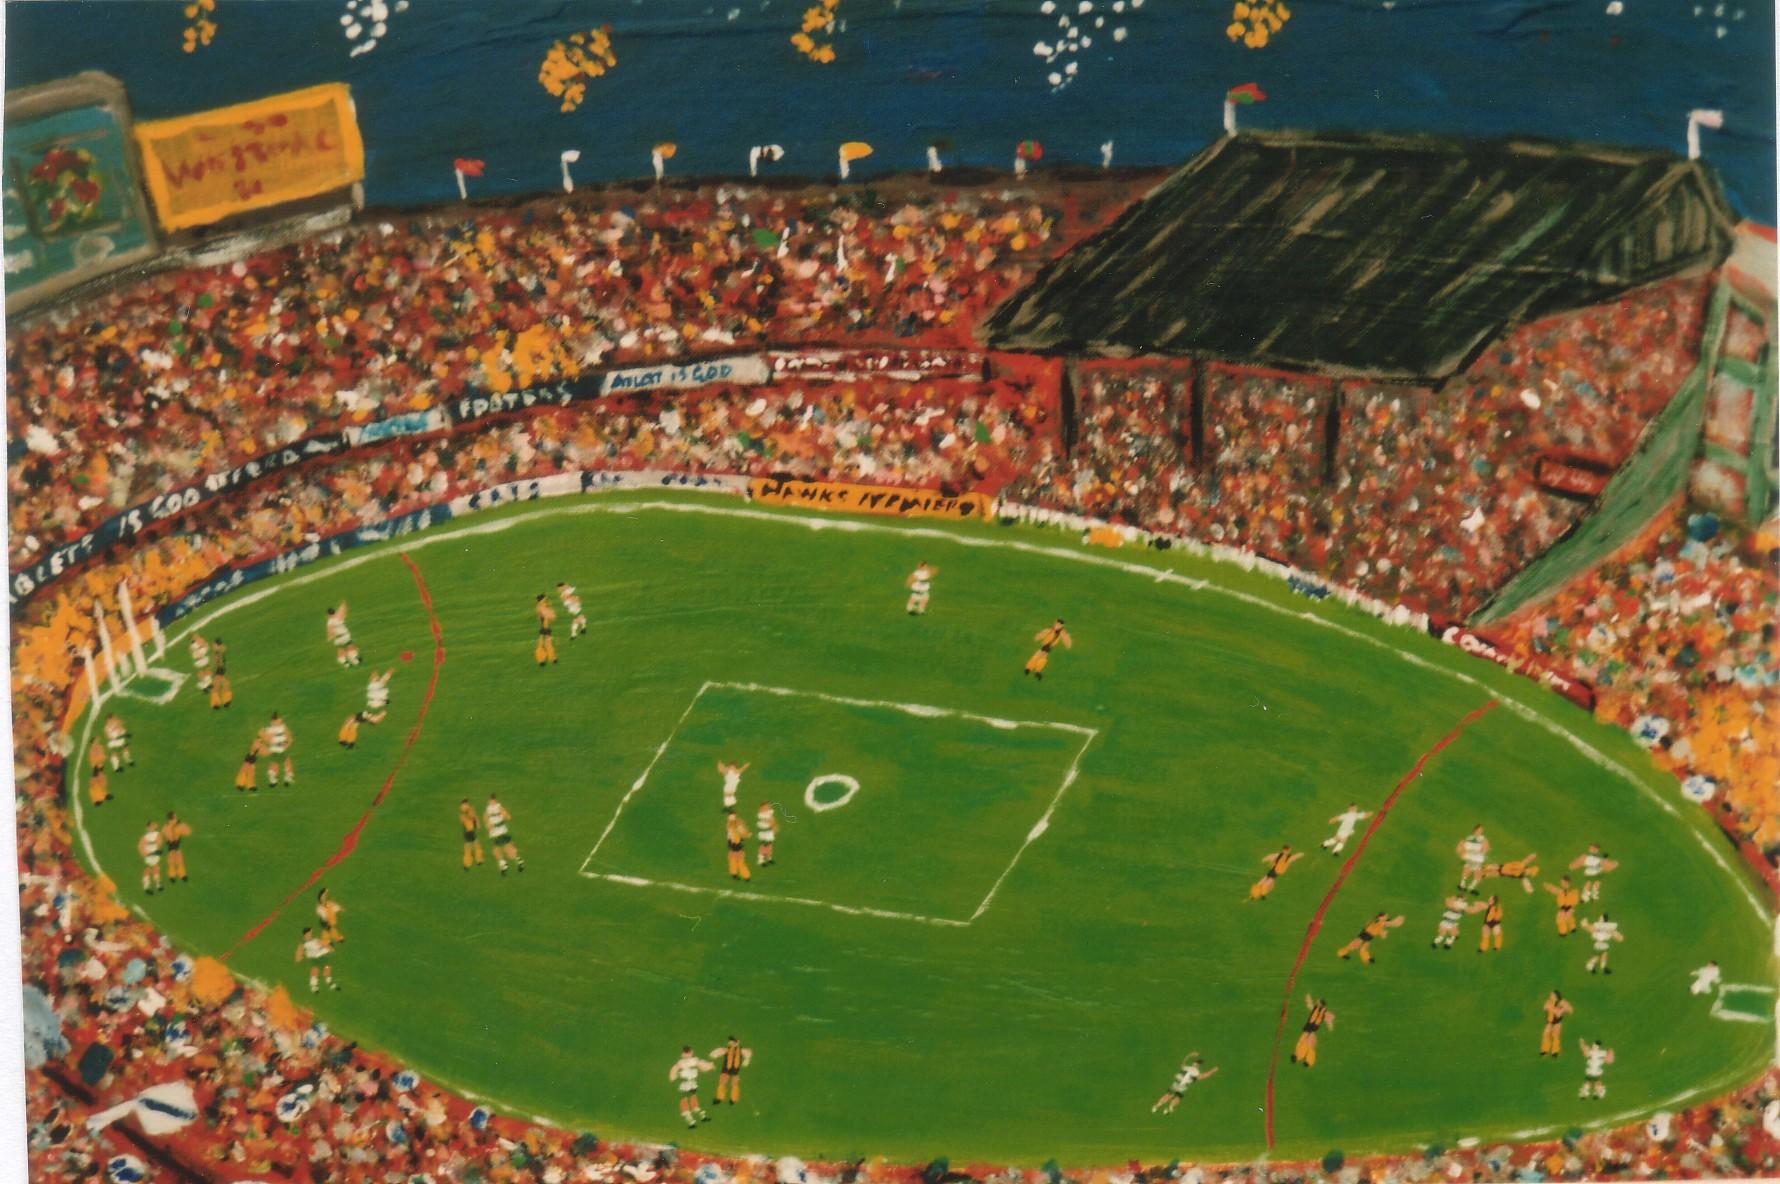 1989 Grand Final